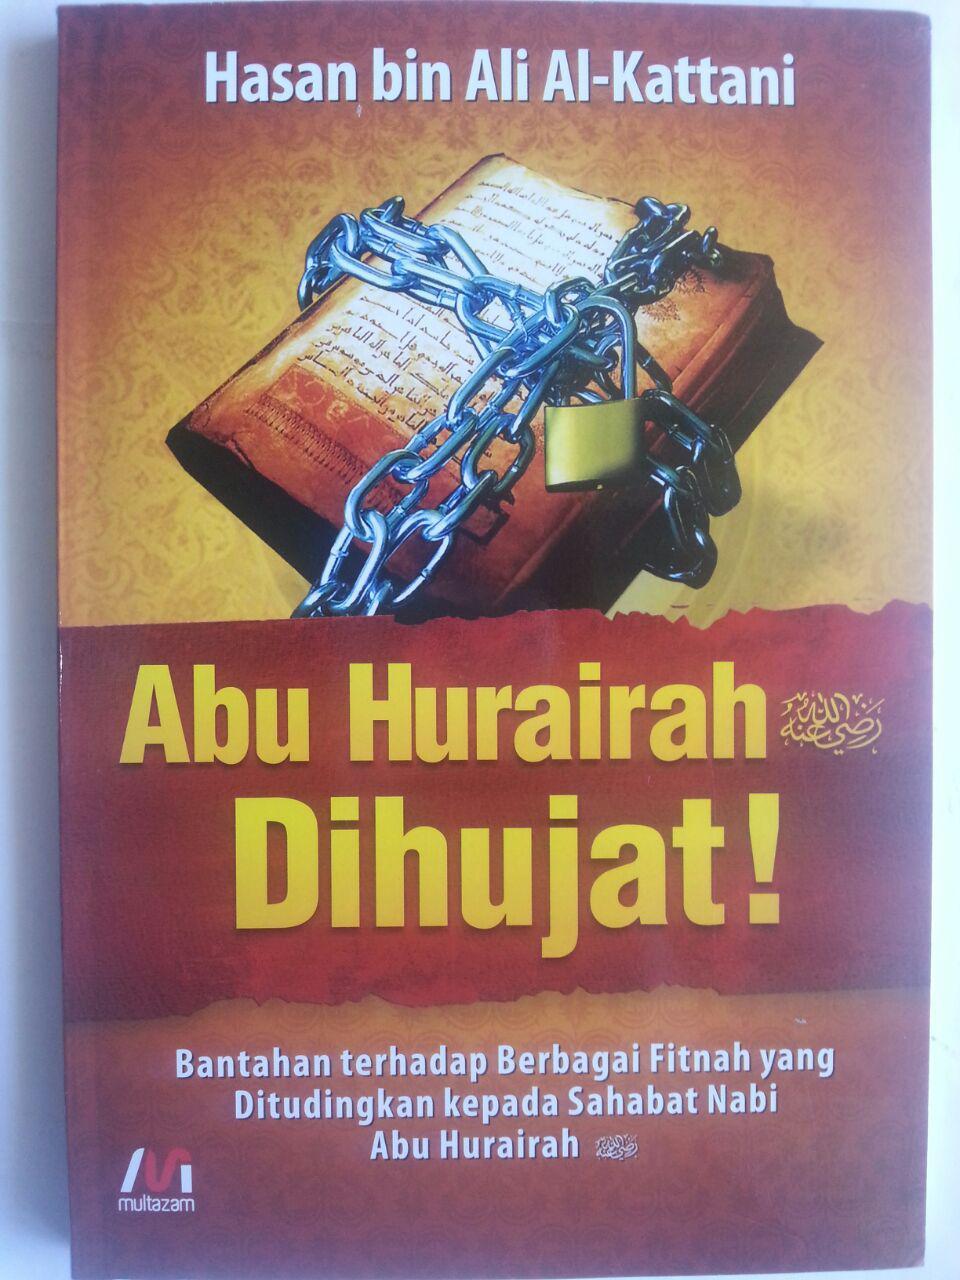 Buku Abu Hurairah Dihujat Bantahan Terhadap Berbagai Fitnah cover 2